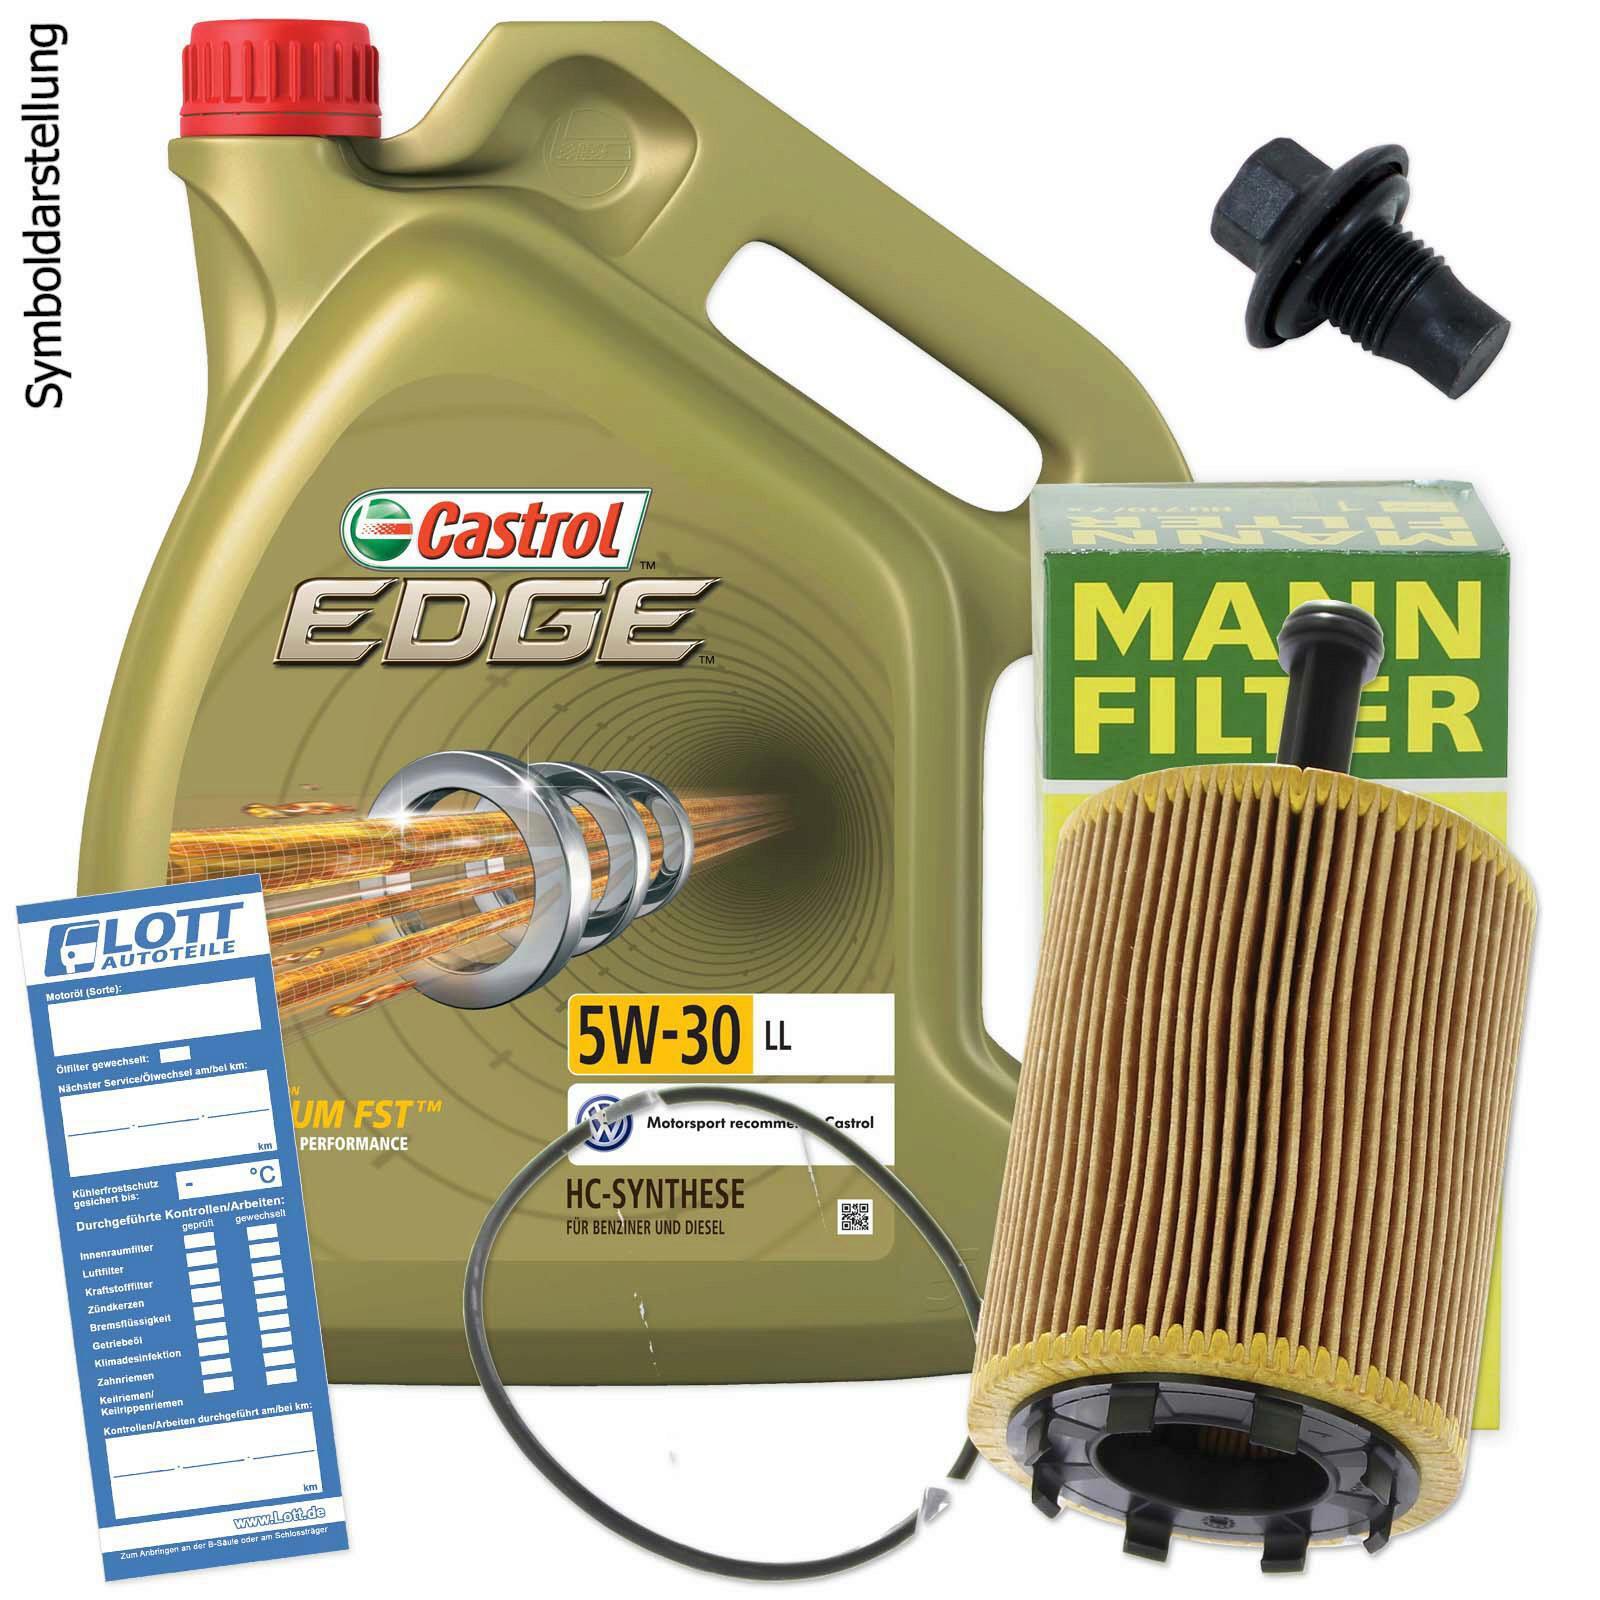 Ölwechsel Set 5L 5W30 Öl Motoröl Castrol + MANN Ölfilter + Ablassschraube